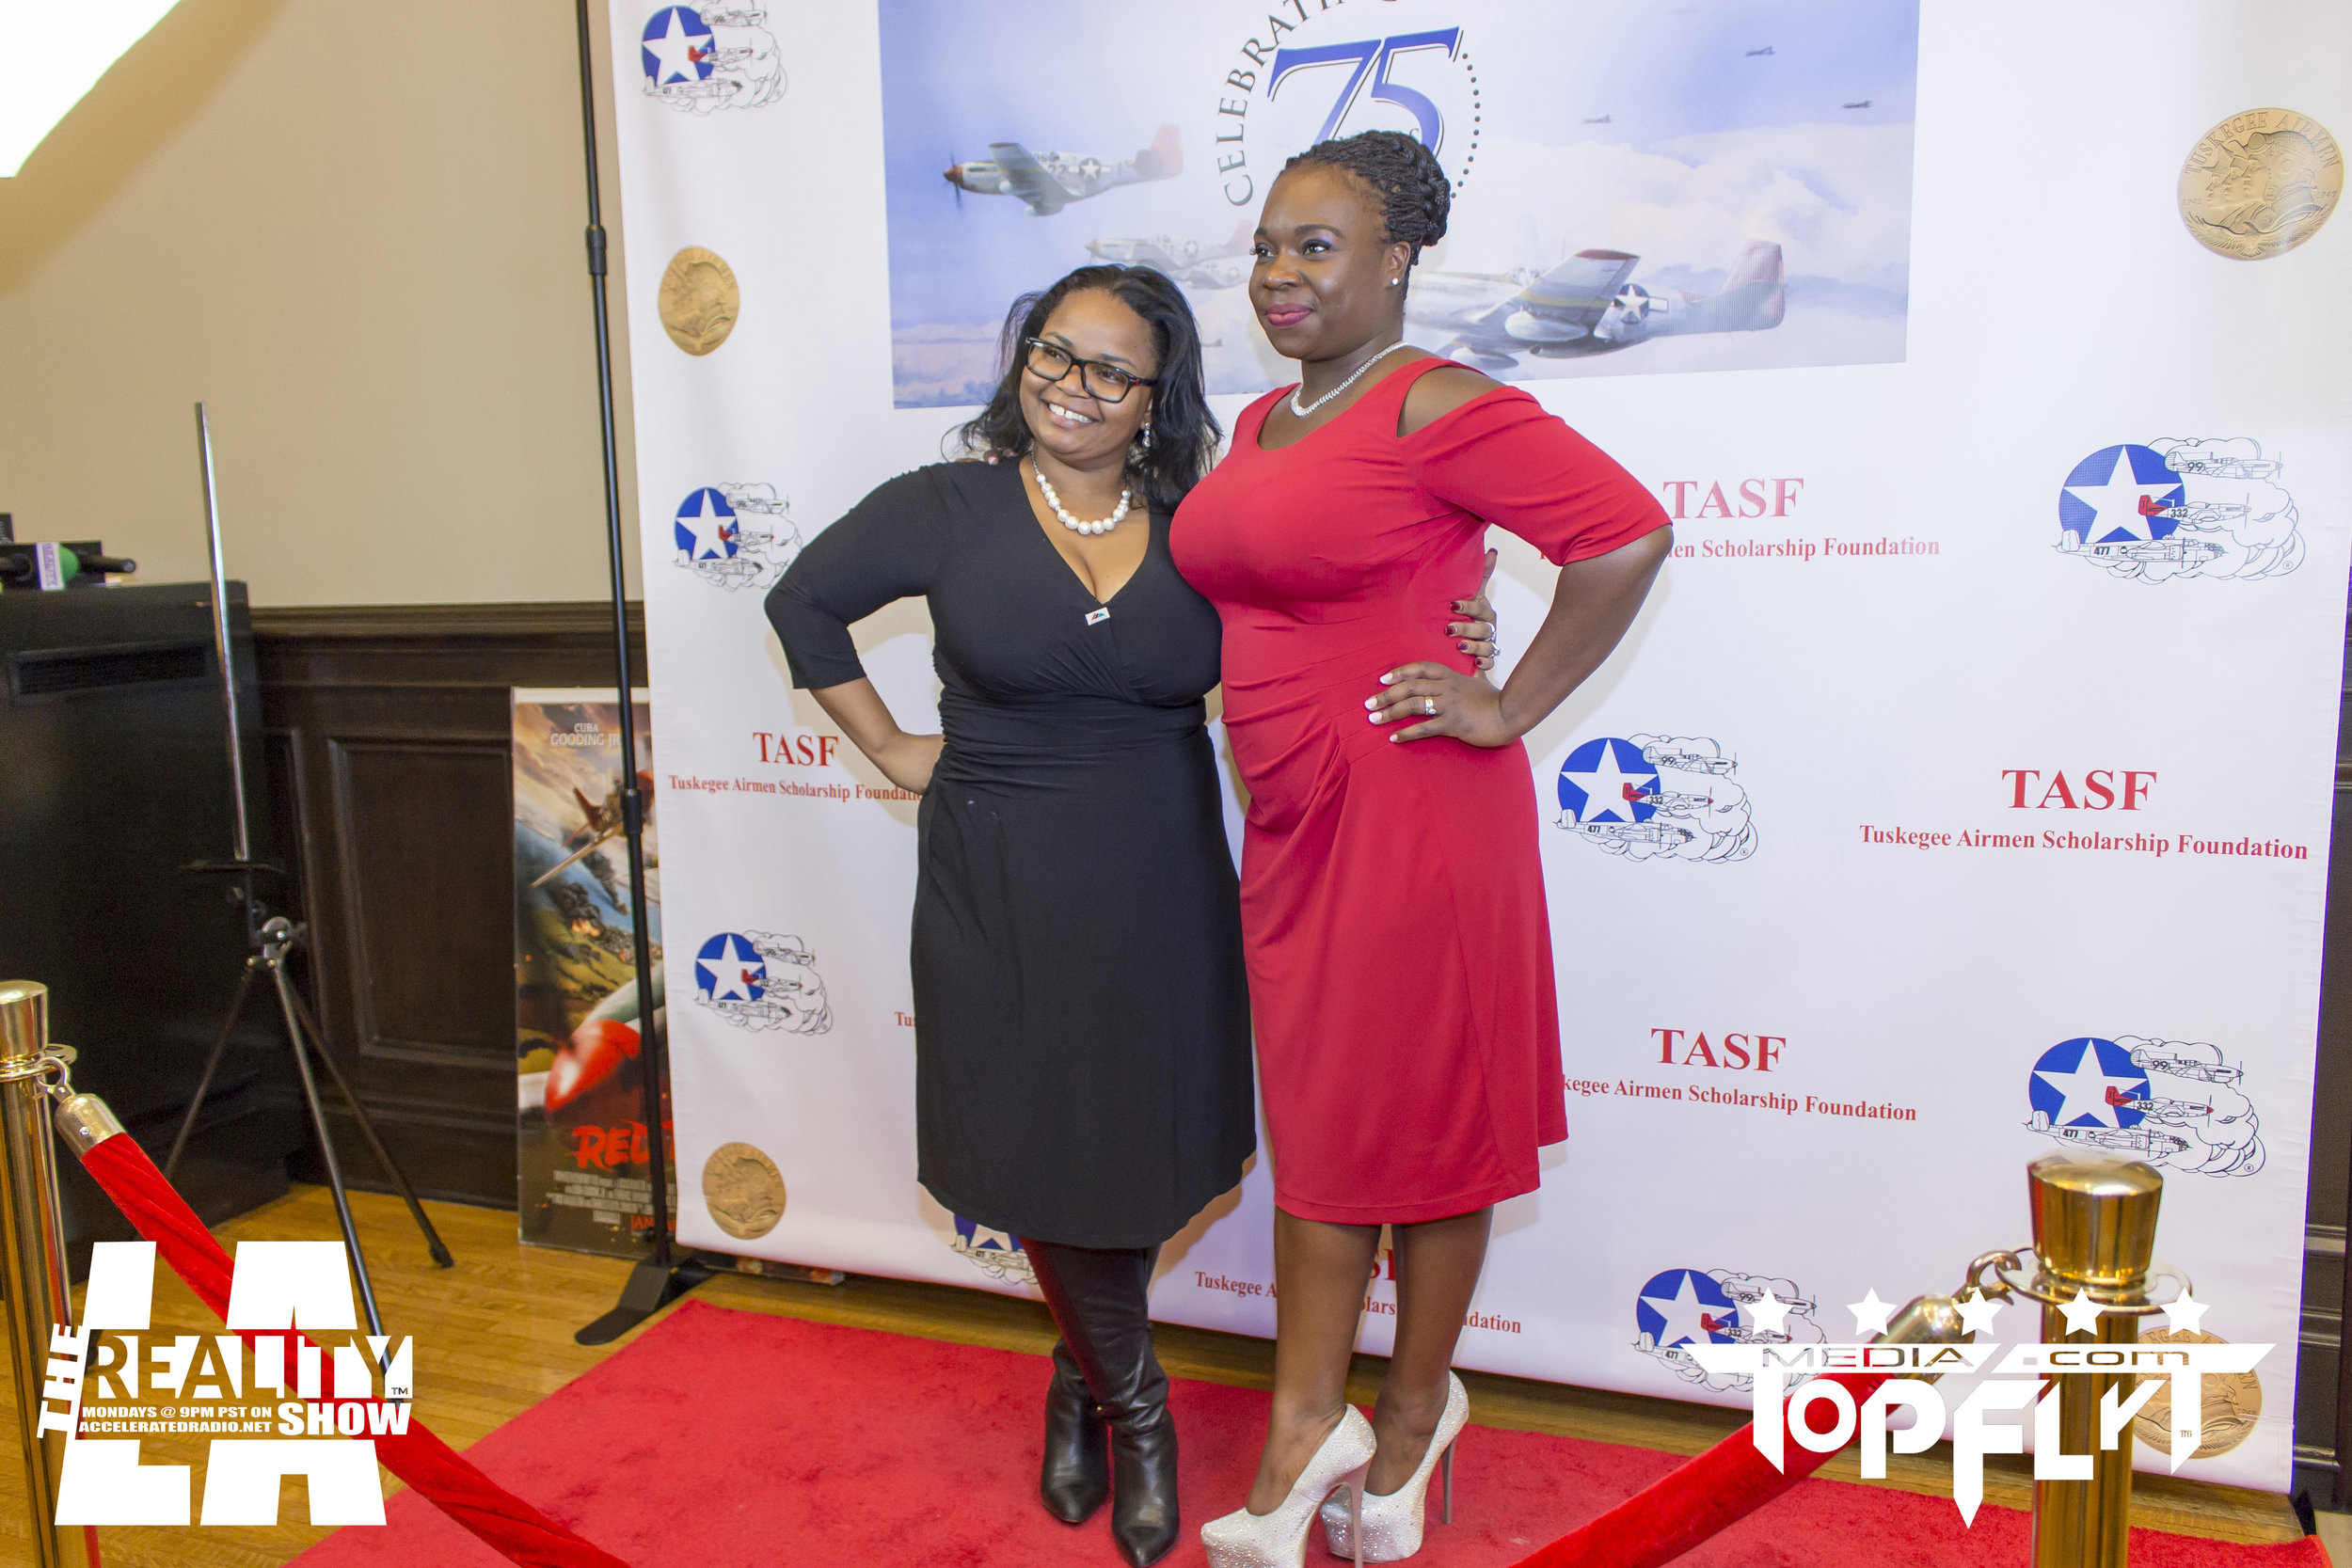 The Reality Show LA - Tuskegee Airmen 75th Anniversary VIP Reception_95.jpg